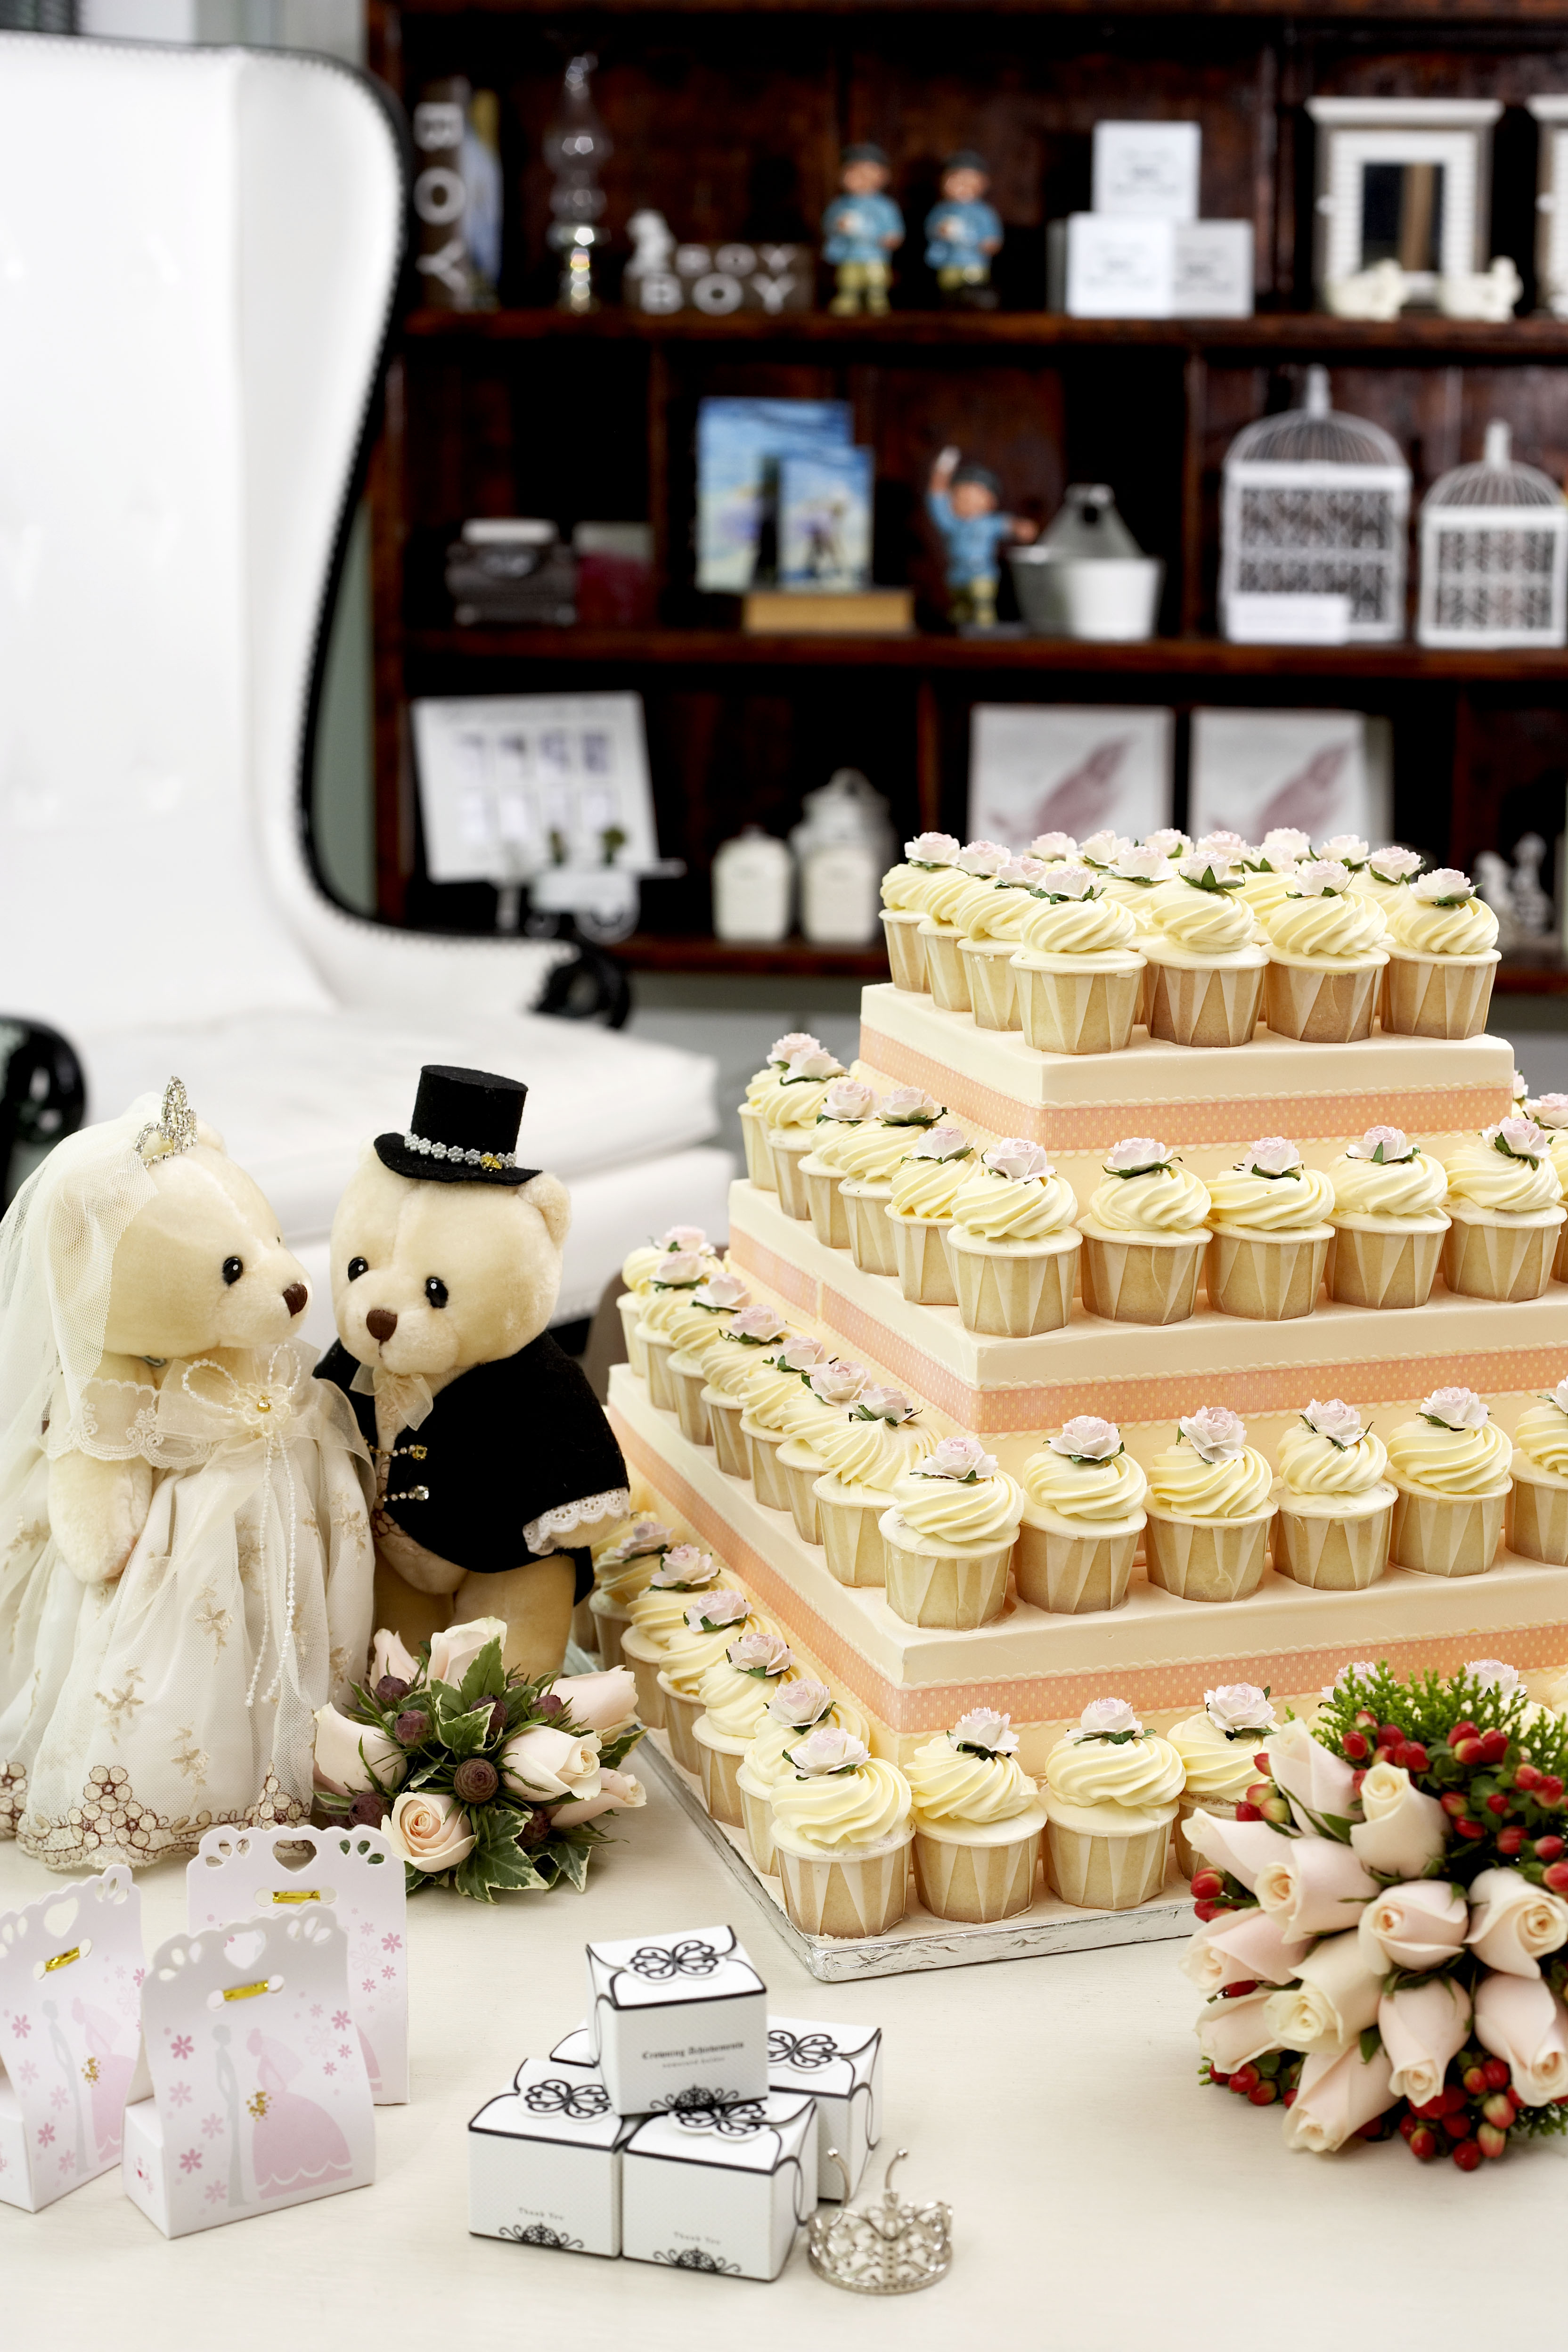 10 Costco Bakery Cupcakes For Weddings Photo - Costco Wedding Cakes ...